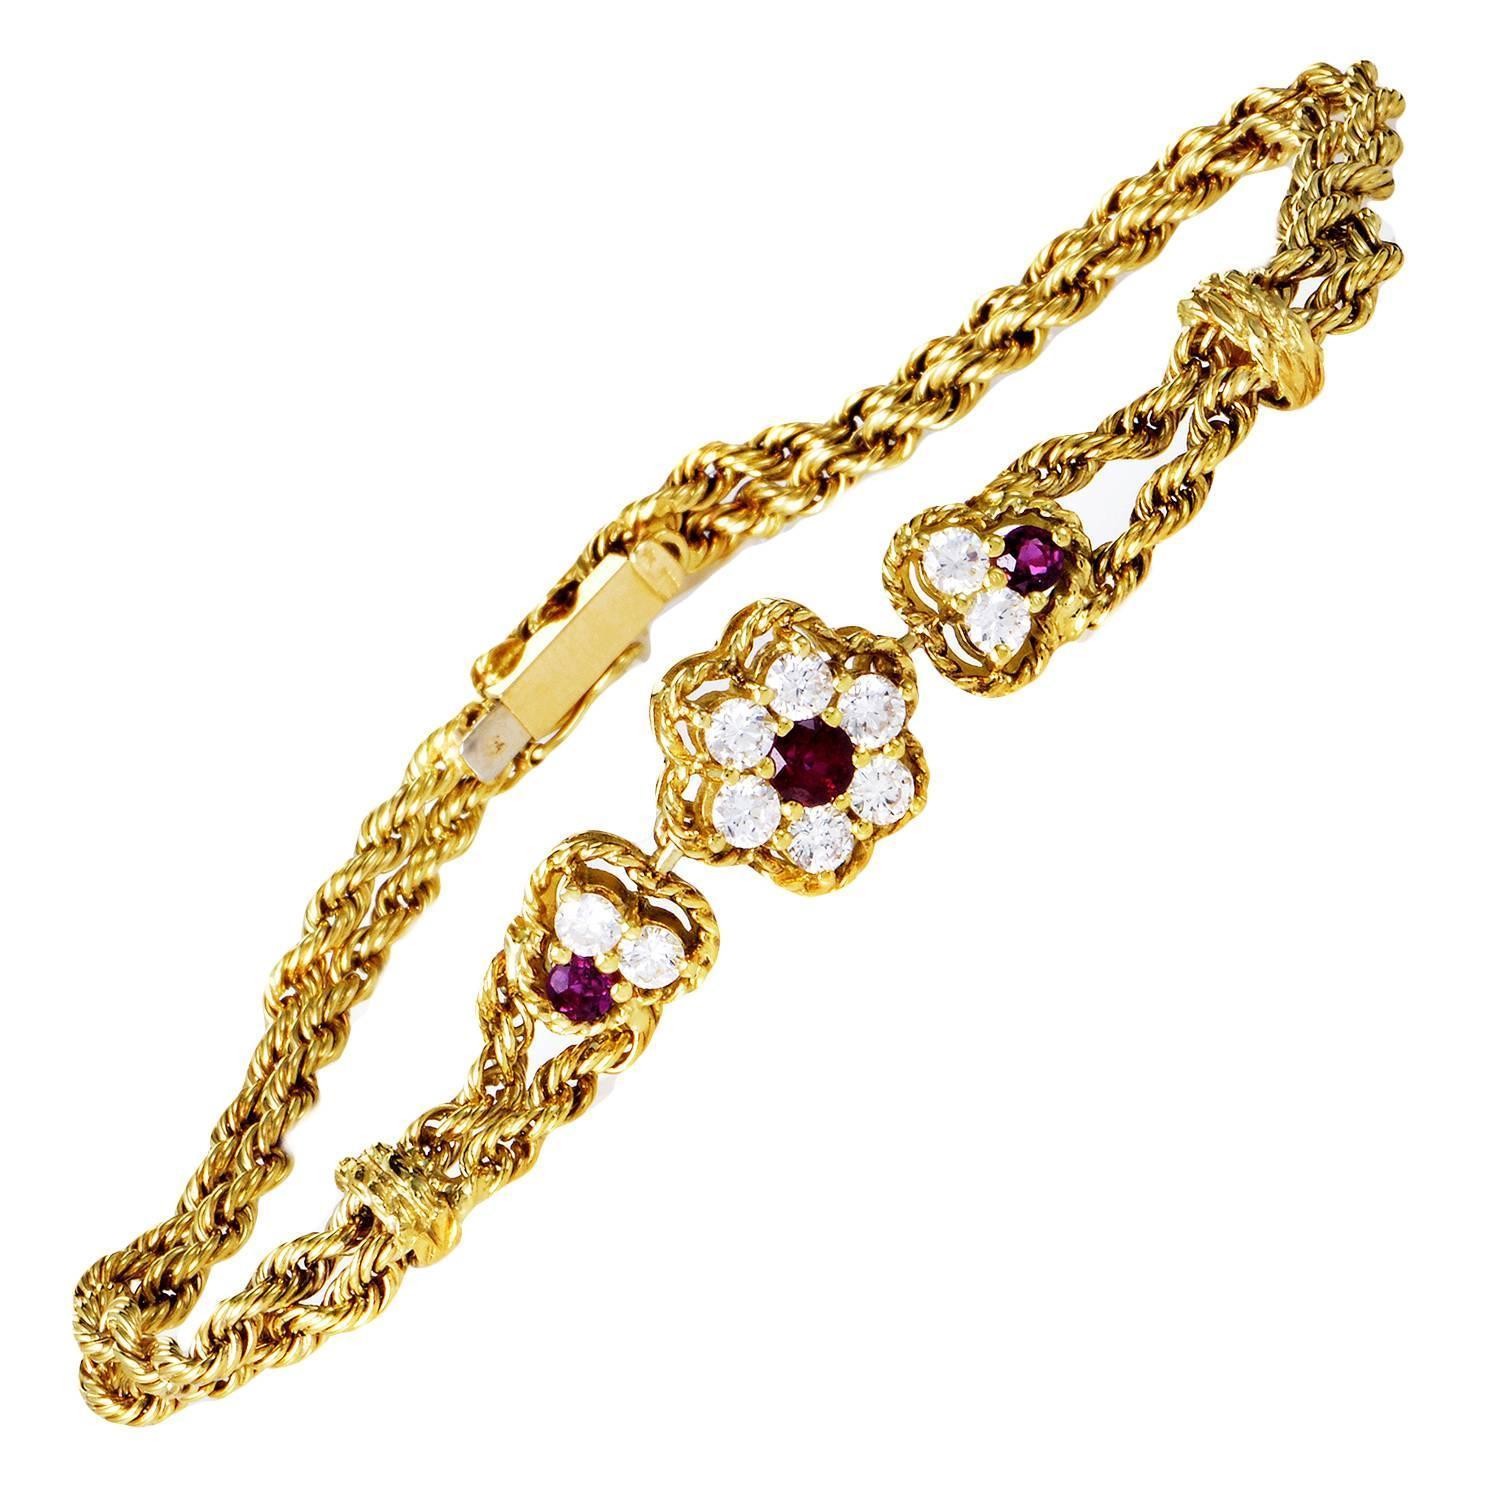 piaget ruby diamond gold floral bracelet at 1stdibs